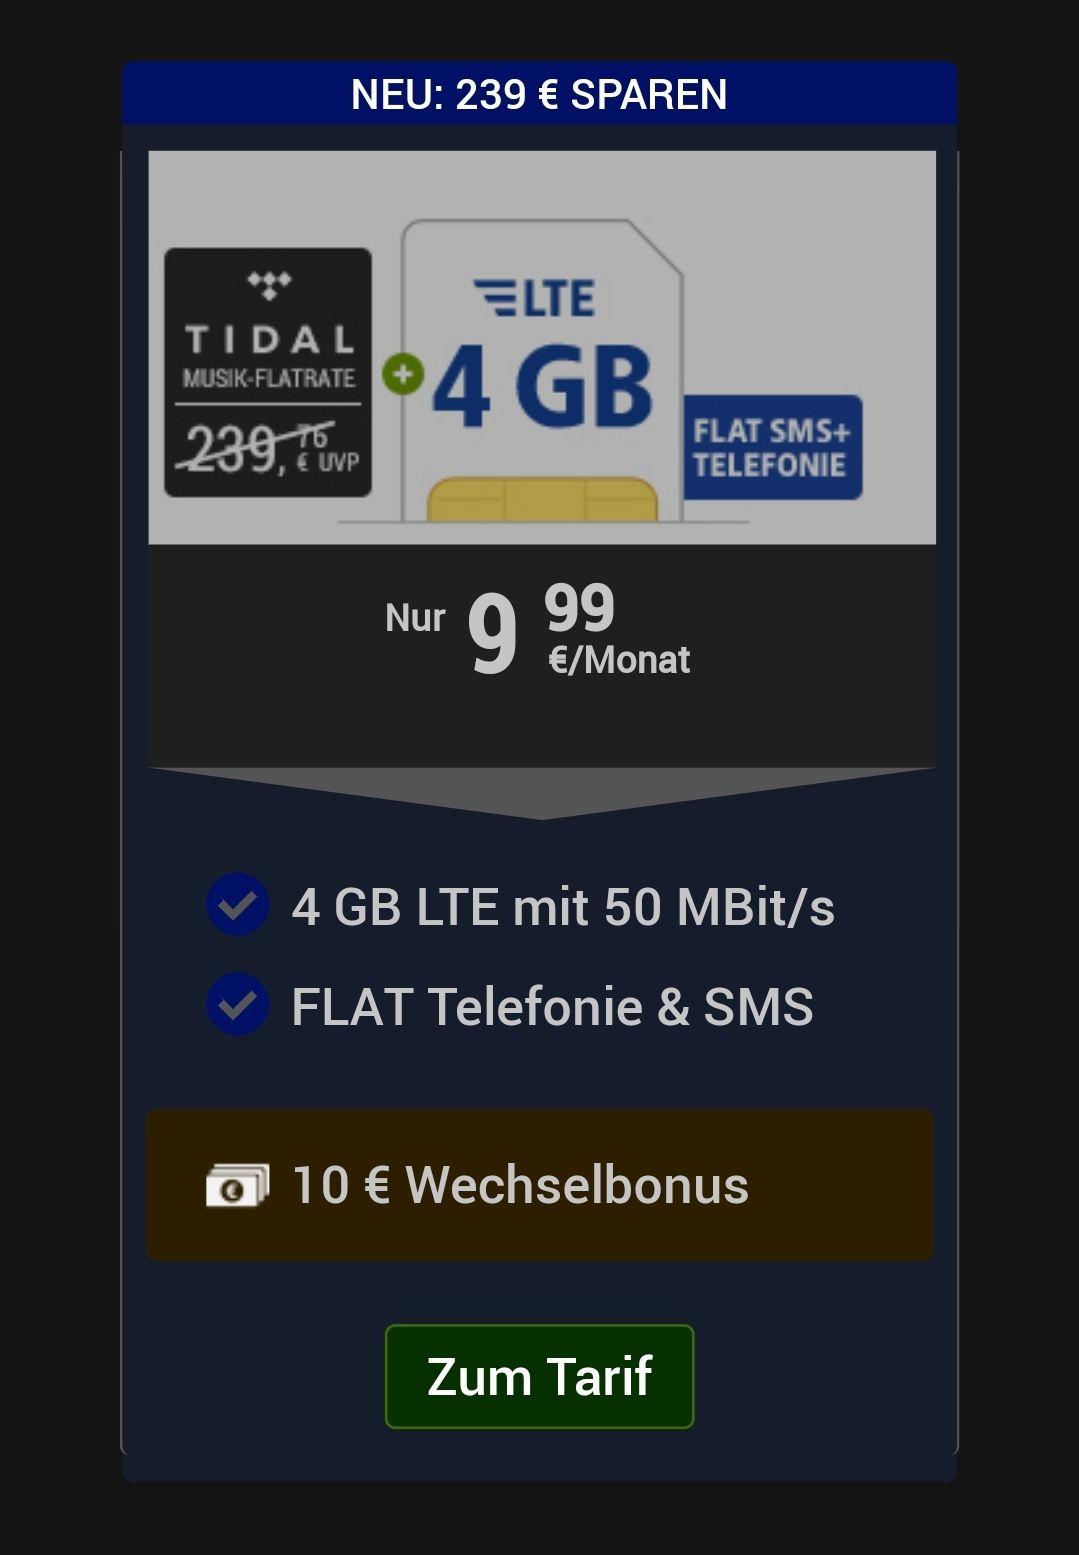 GMX 4 Gb 9,99€ Allnetflat LTE 50mbits/S 02-Netz + 24 Monate Tidal Gratis (Wert: 239,76€)